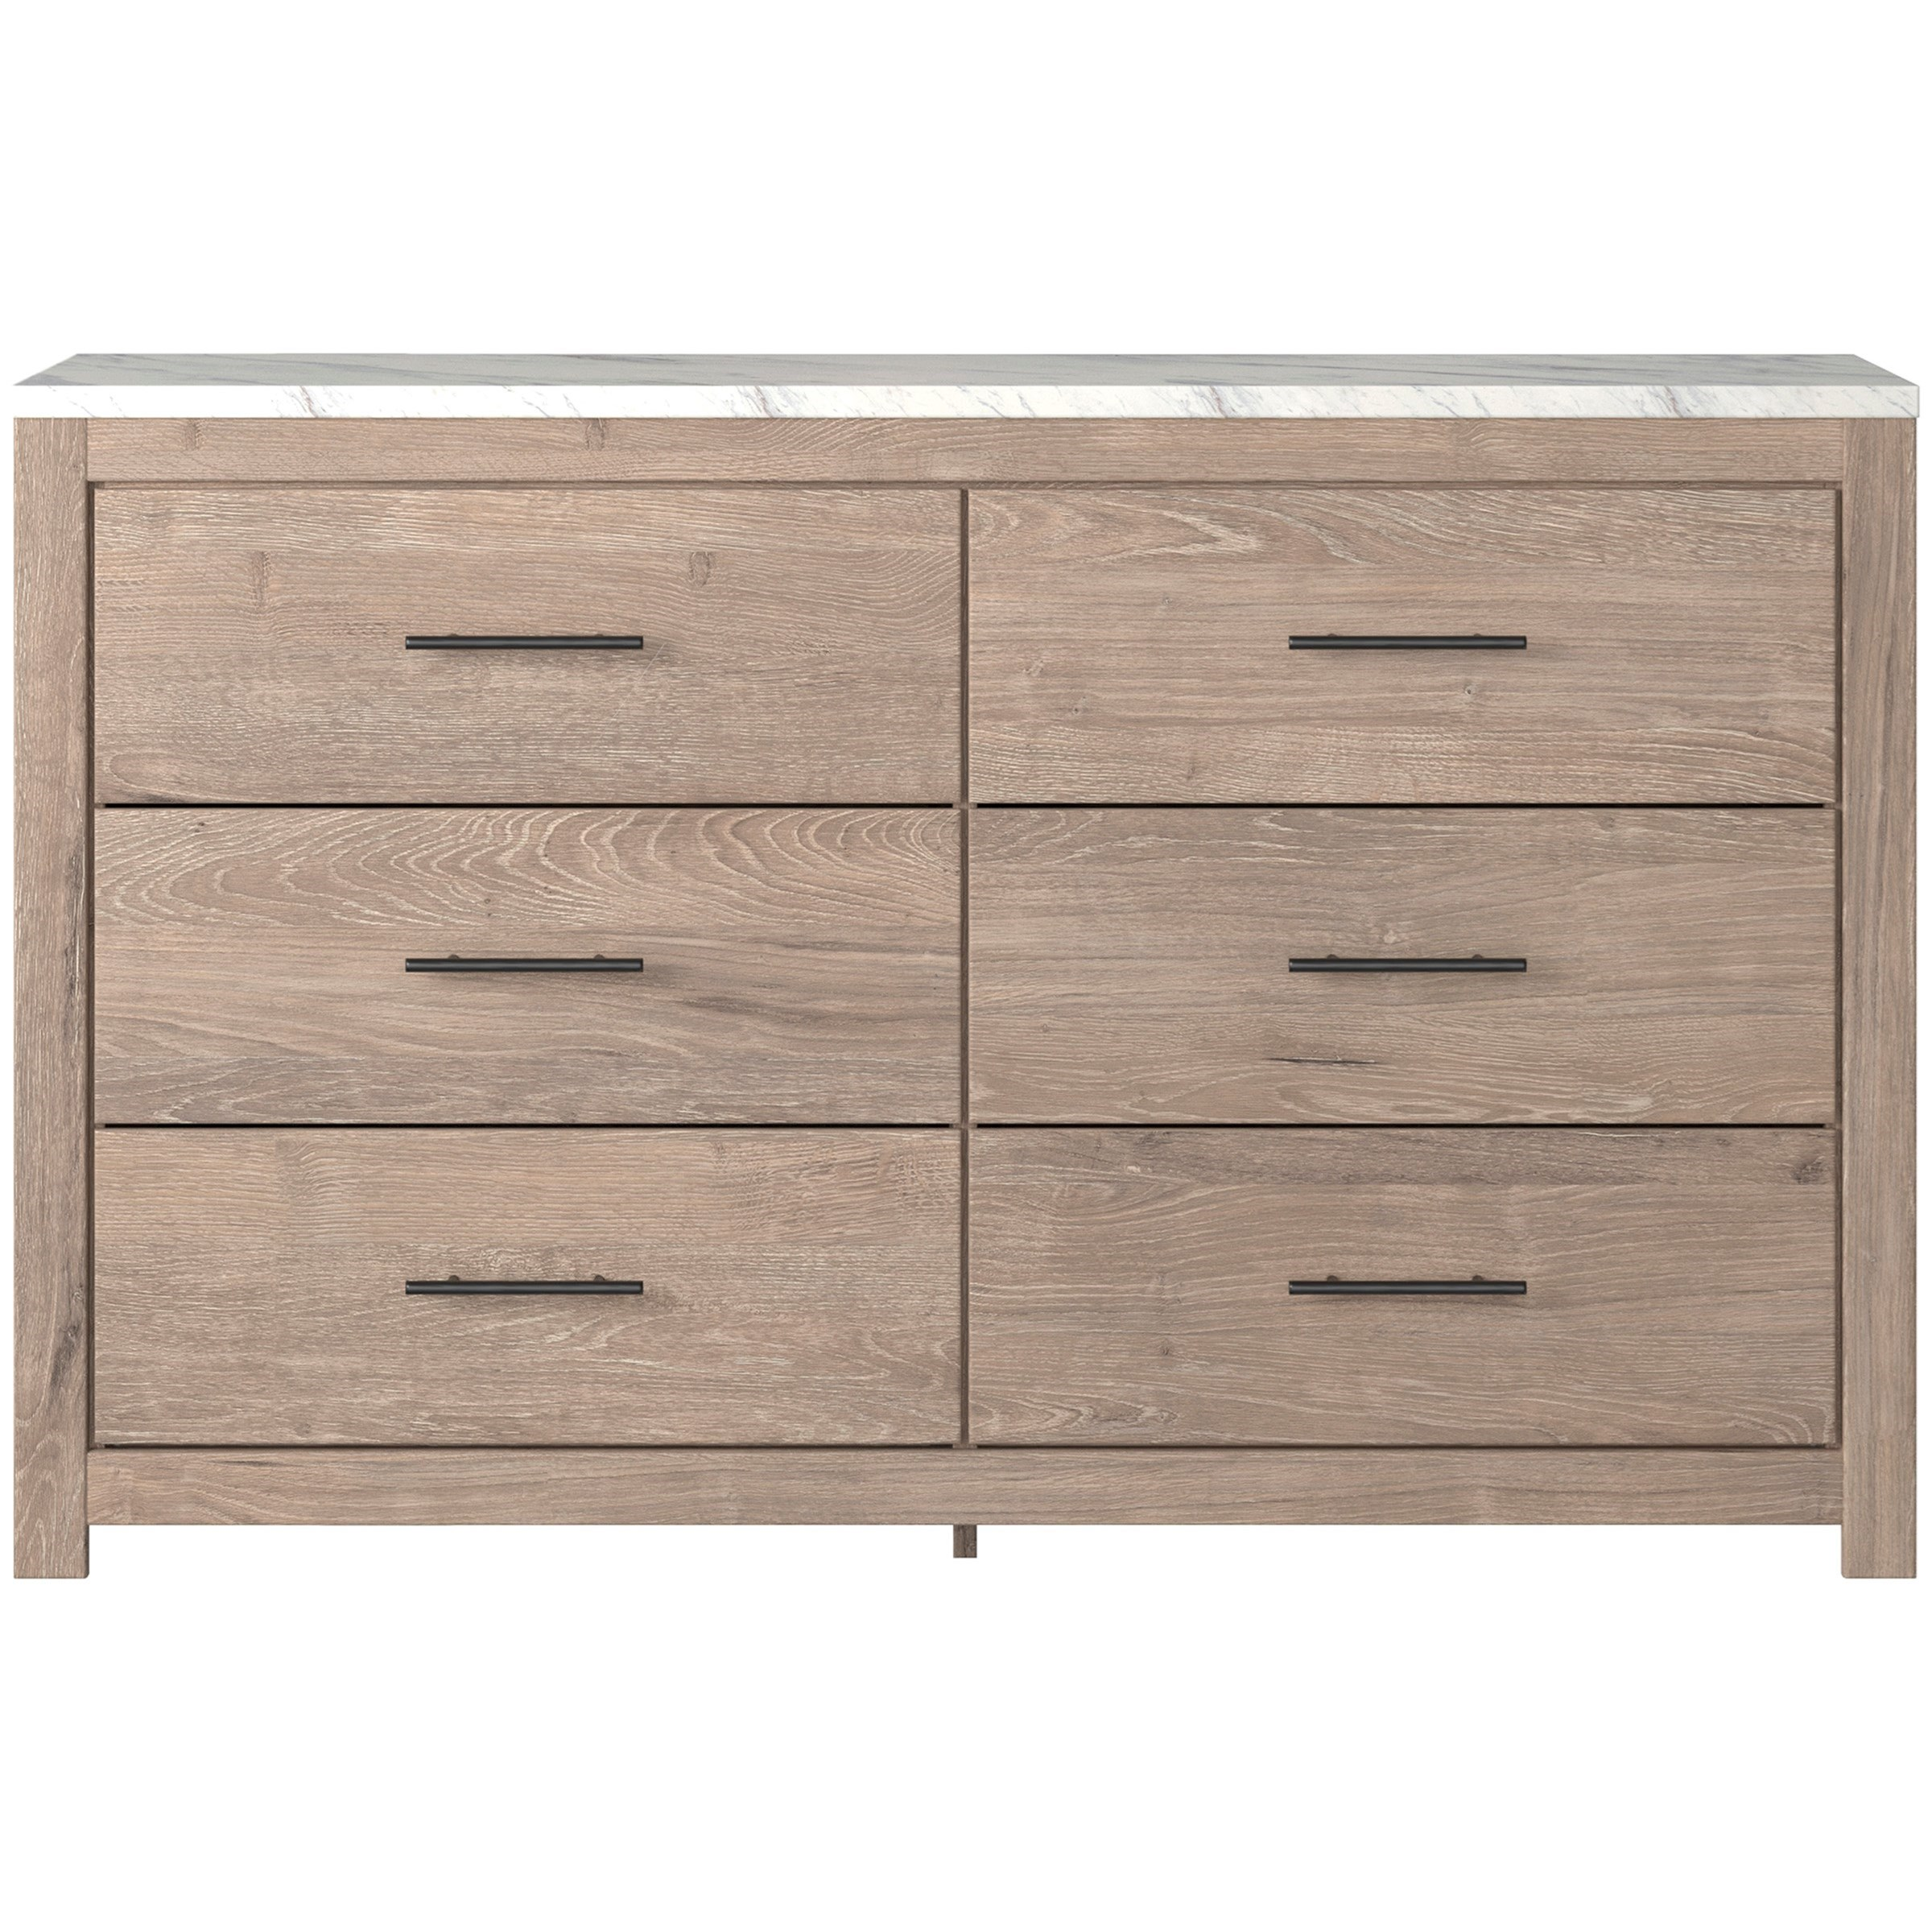 Senniberg Dresser by Signature Design by Ashley at Standard Furniture